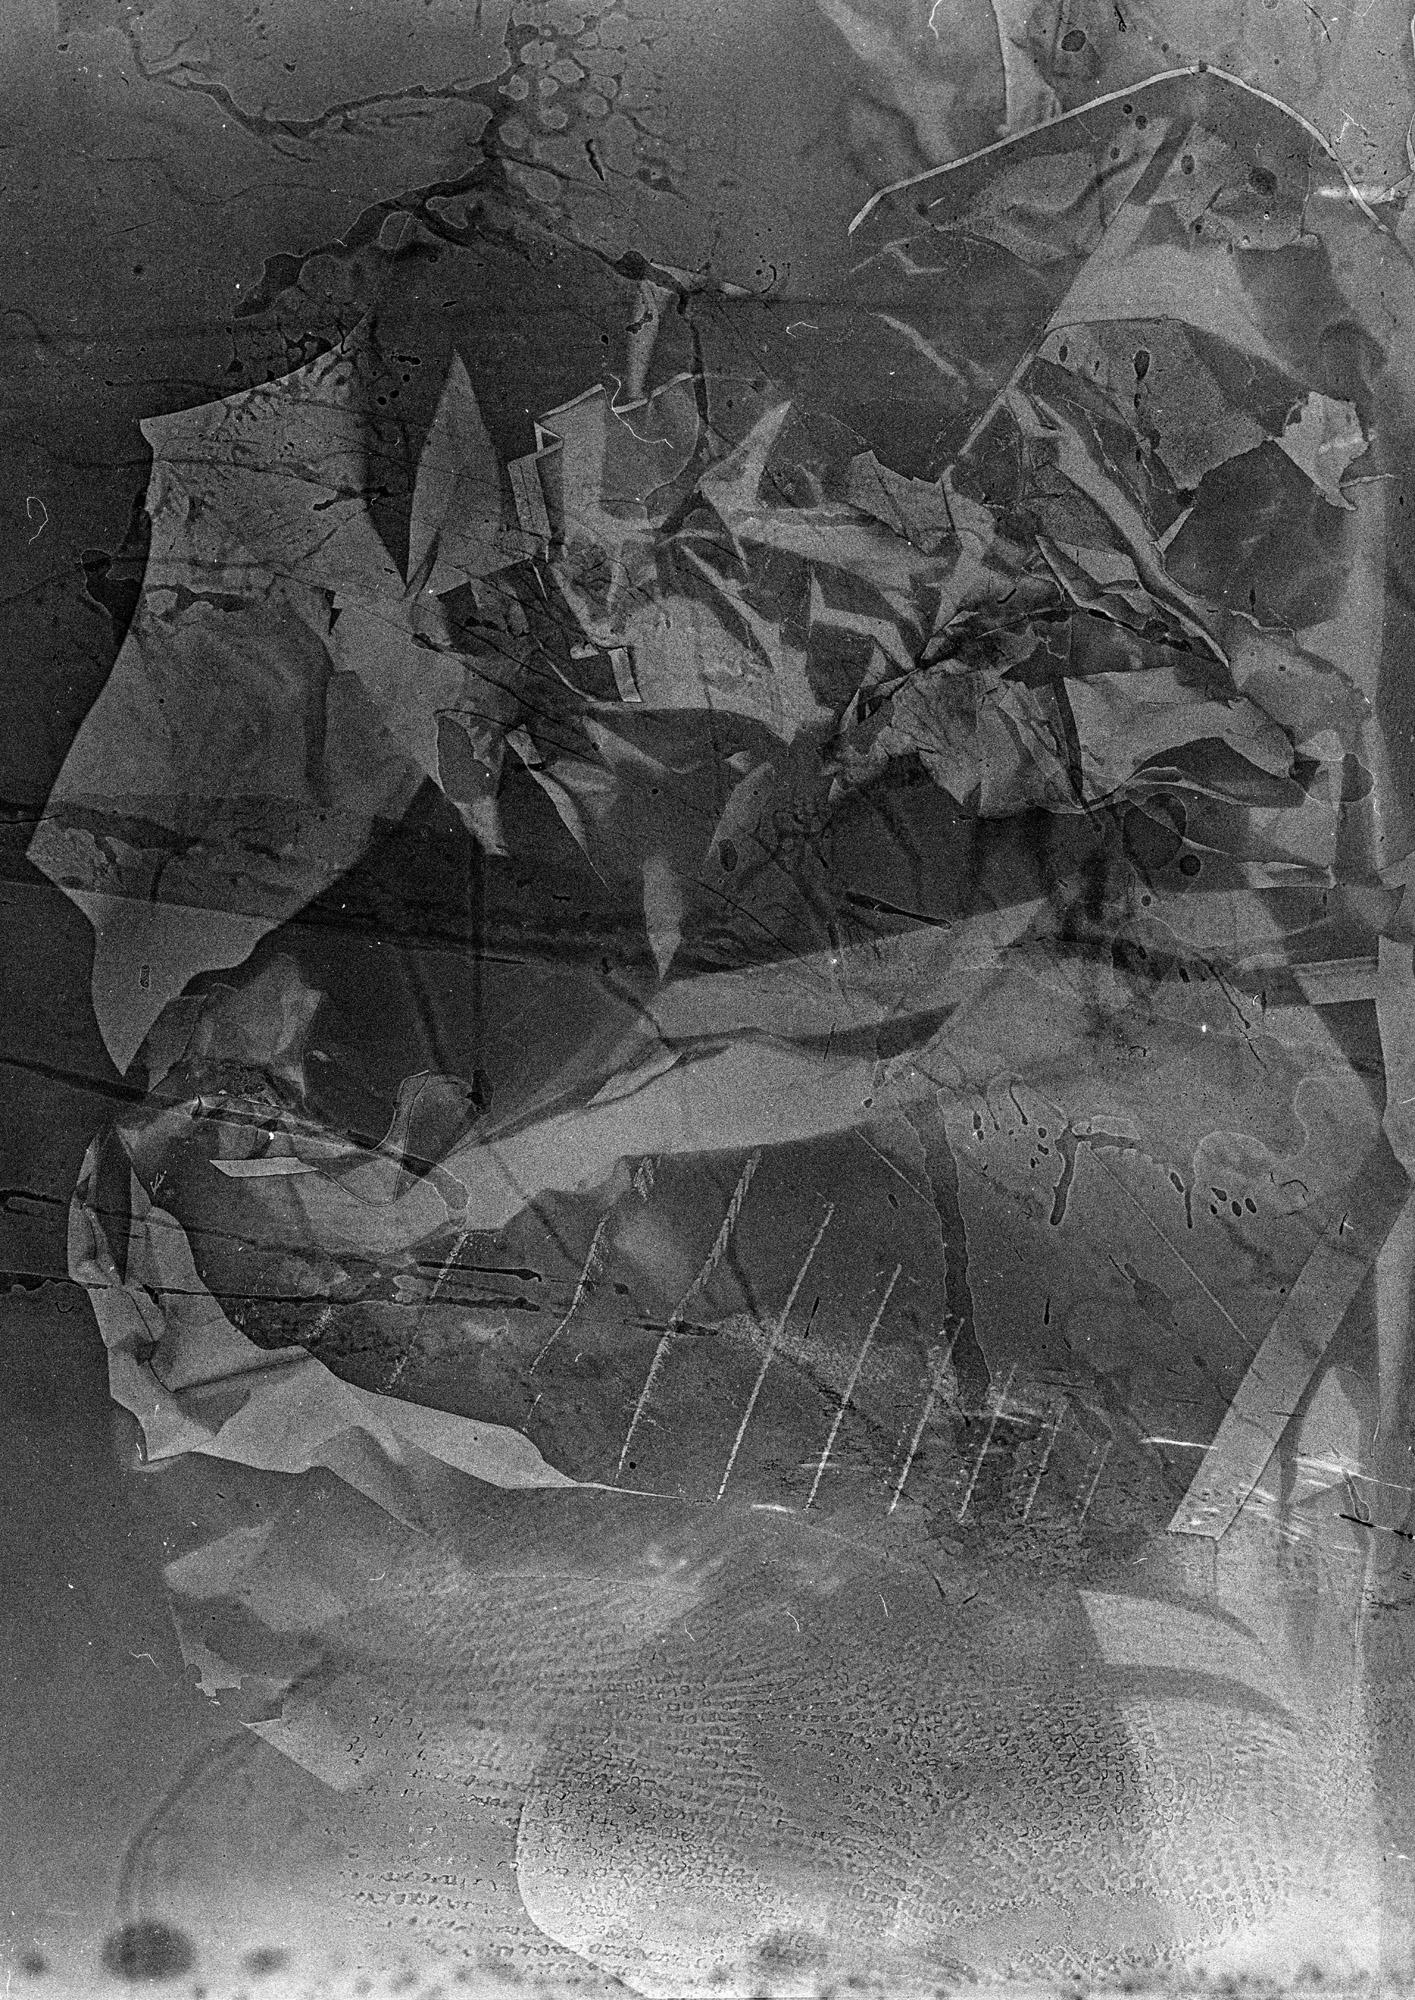 polarprintfinal_0004_Untitled-1_0006_Layer 3.jpg